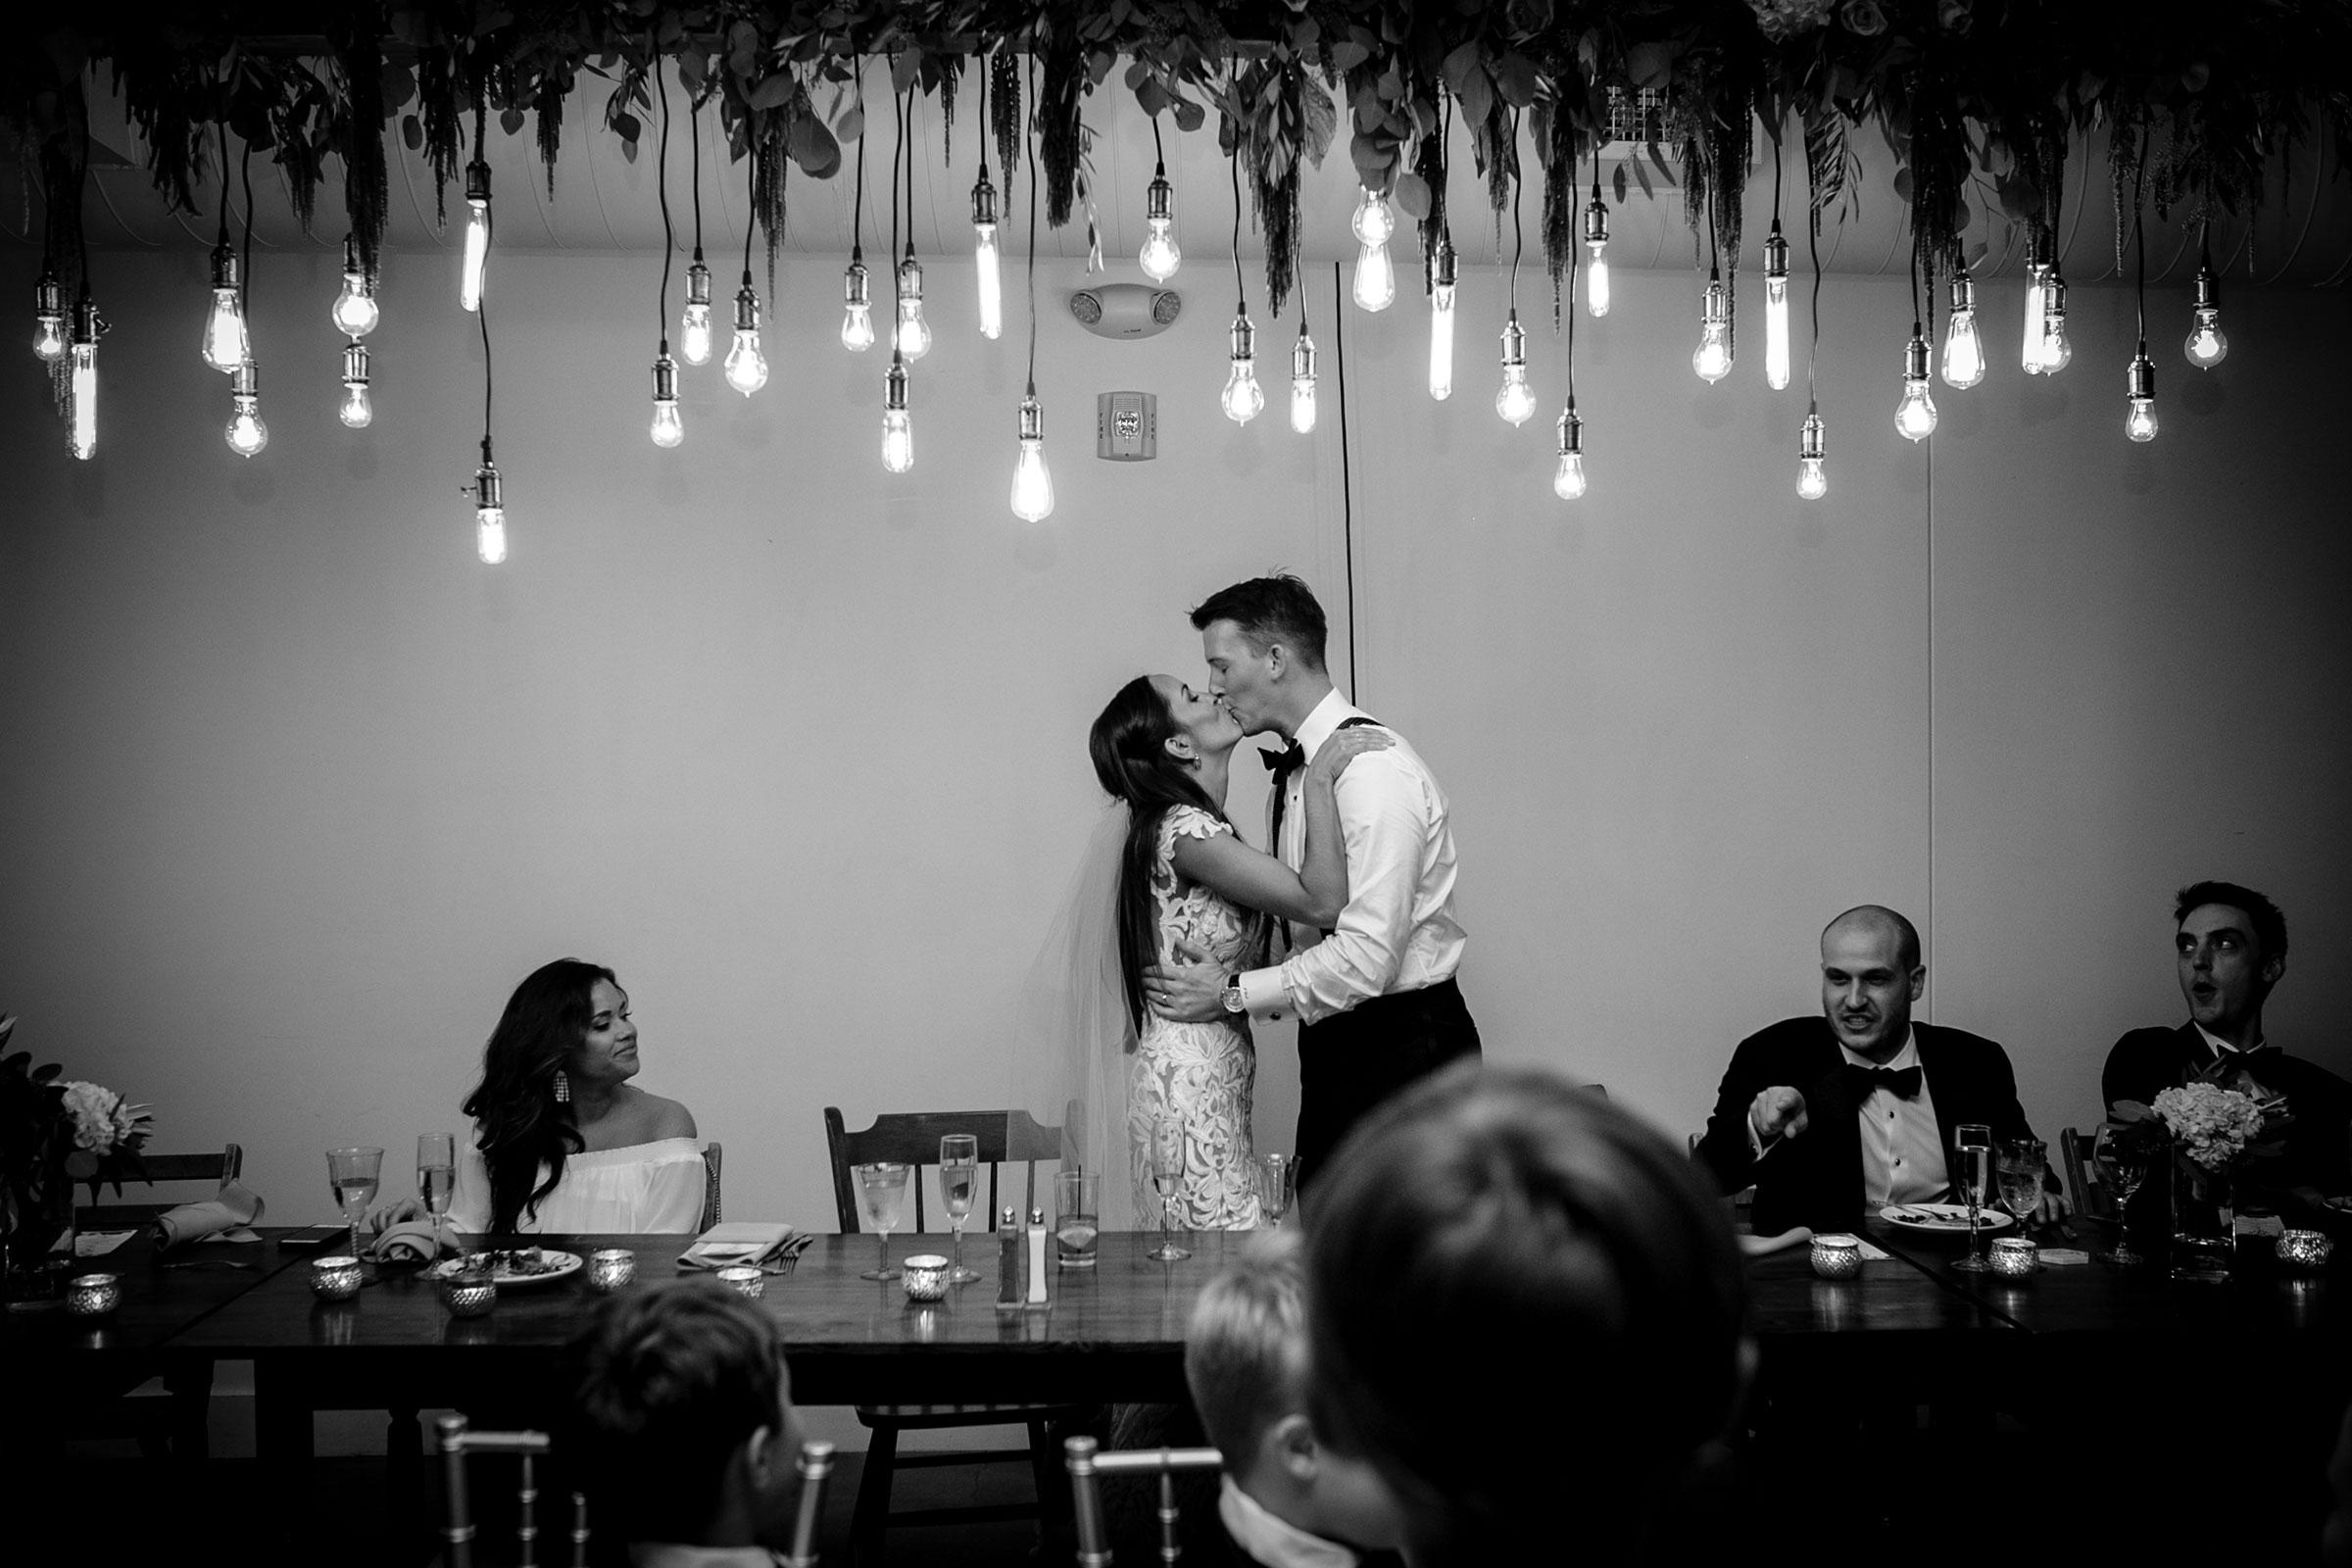 bride-groom-kissing-at-head-table-founders-one-nine-omaha-nebraska-raelyn-ramey-photography.jpg